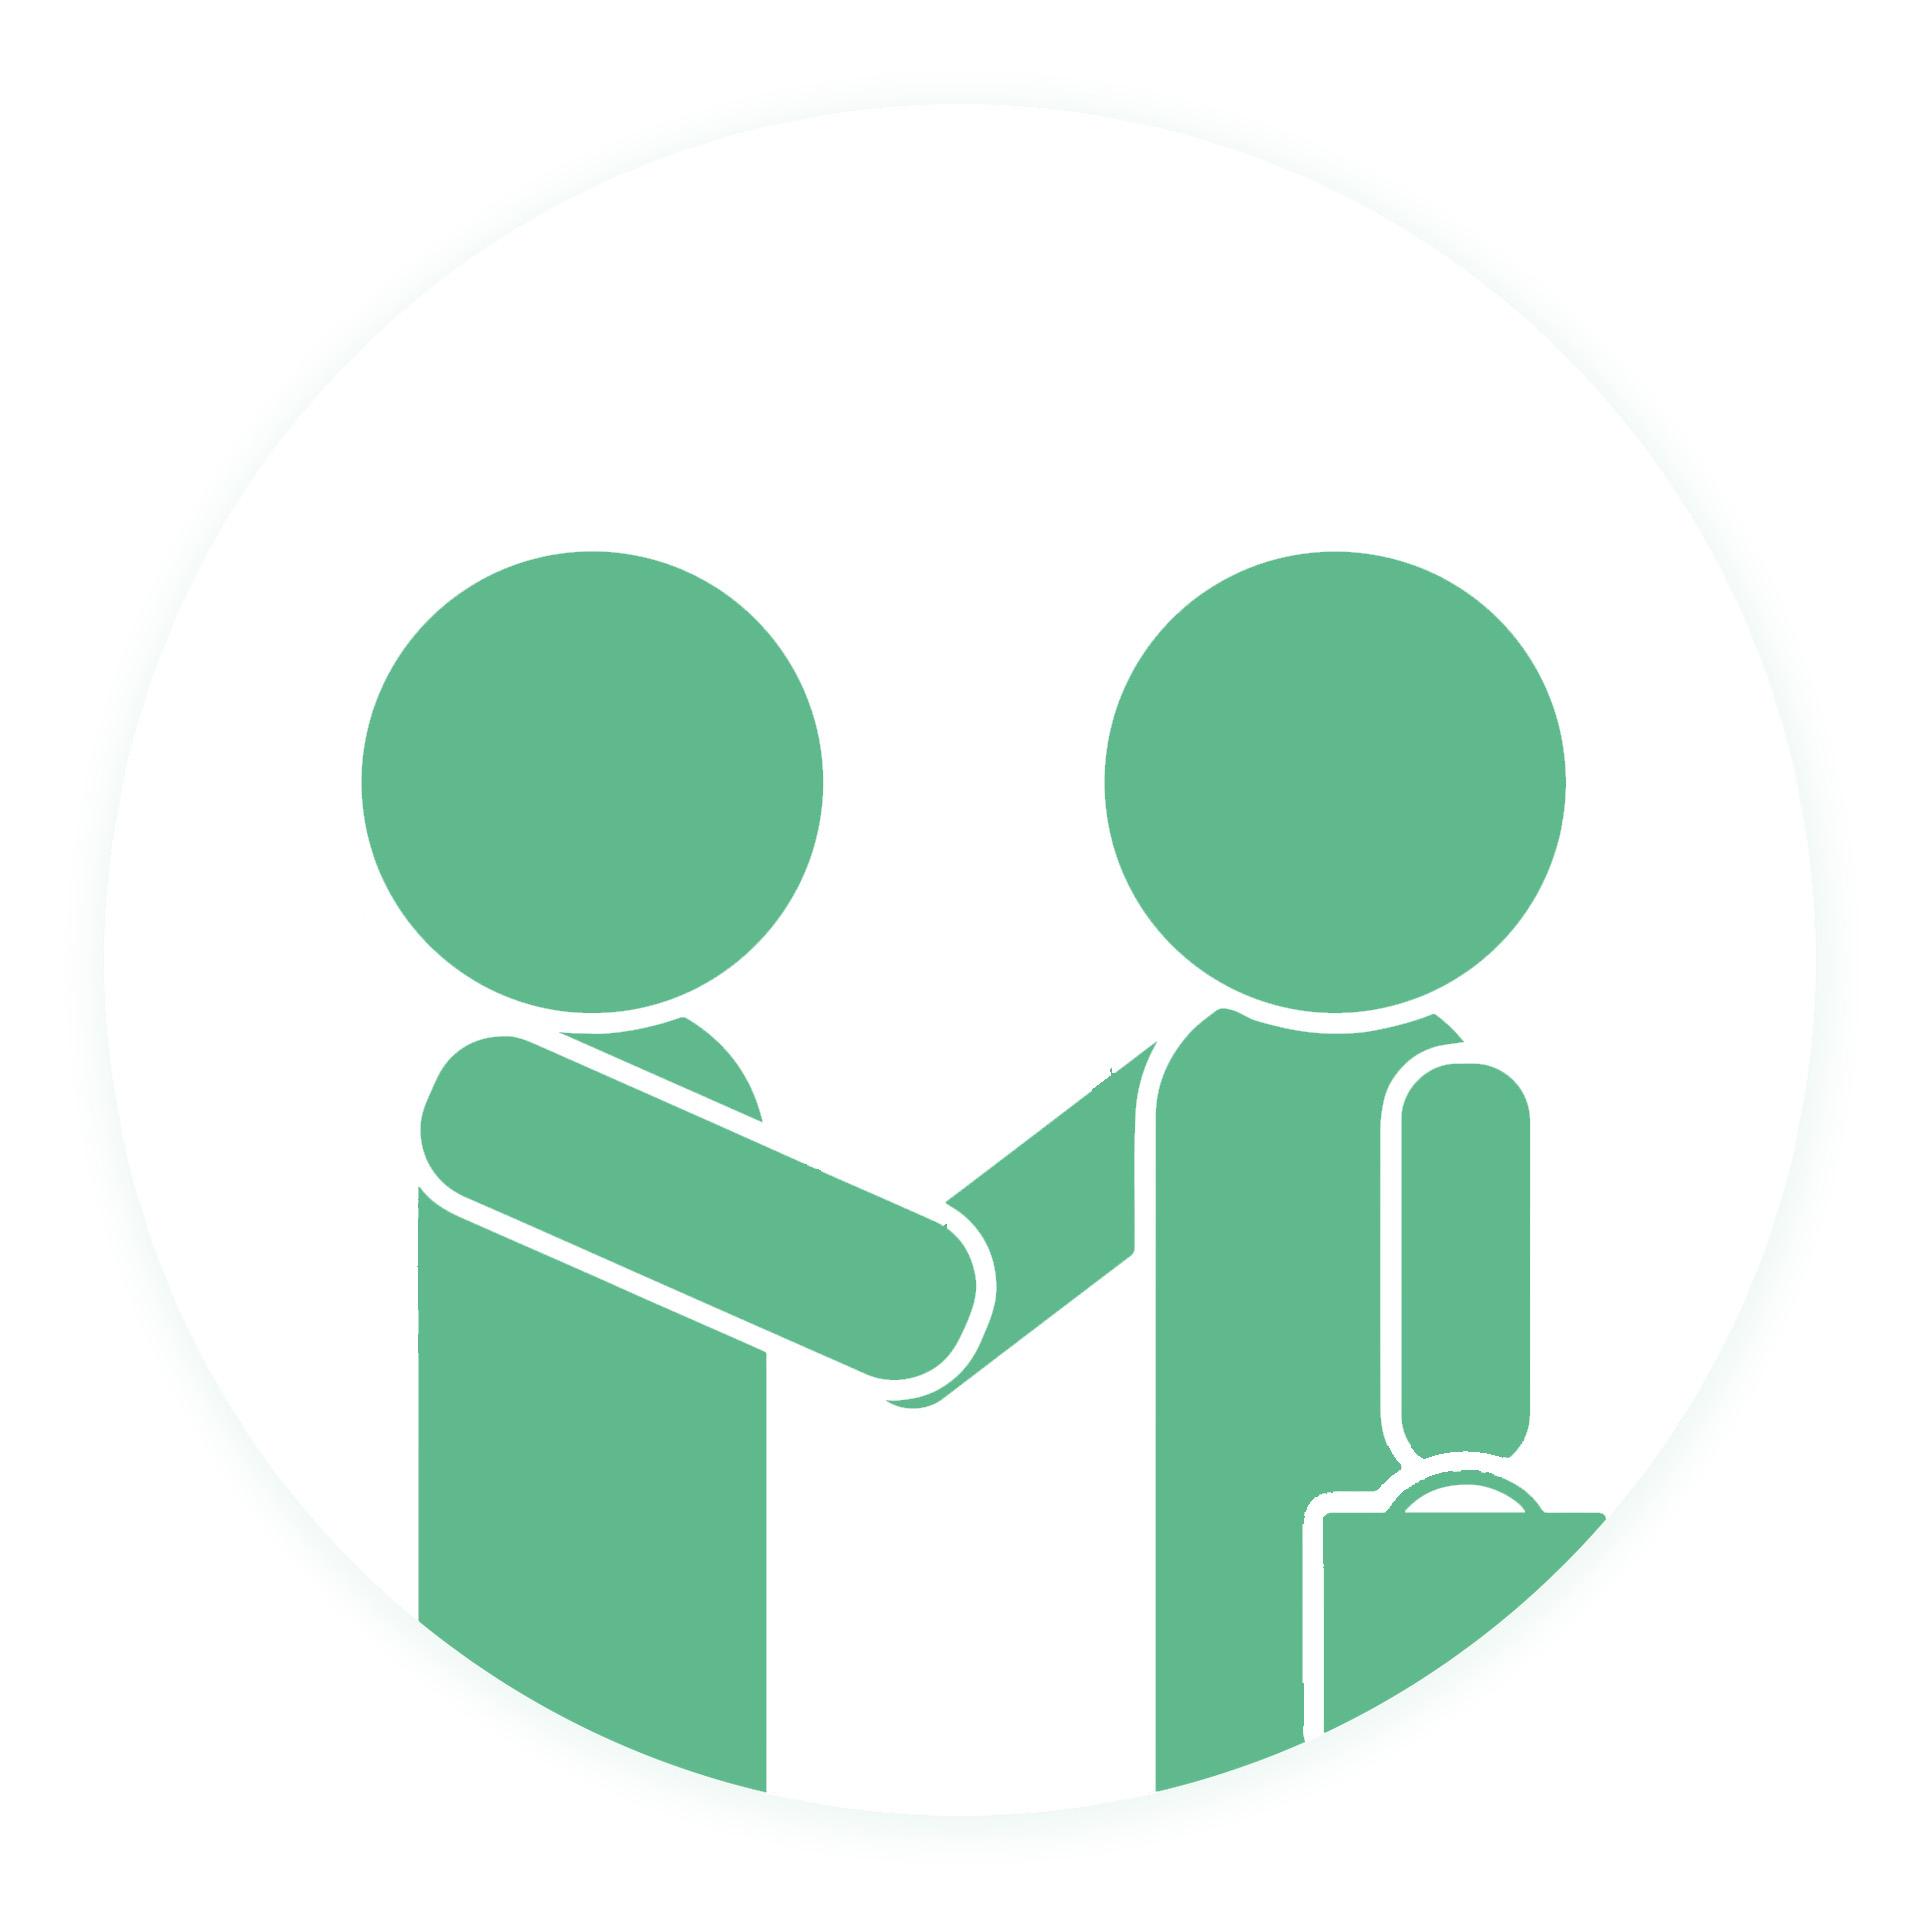 https://www.leadtributor.com/wp-content/uploads/customer-service-1433640_1920-Kopie.jpg